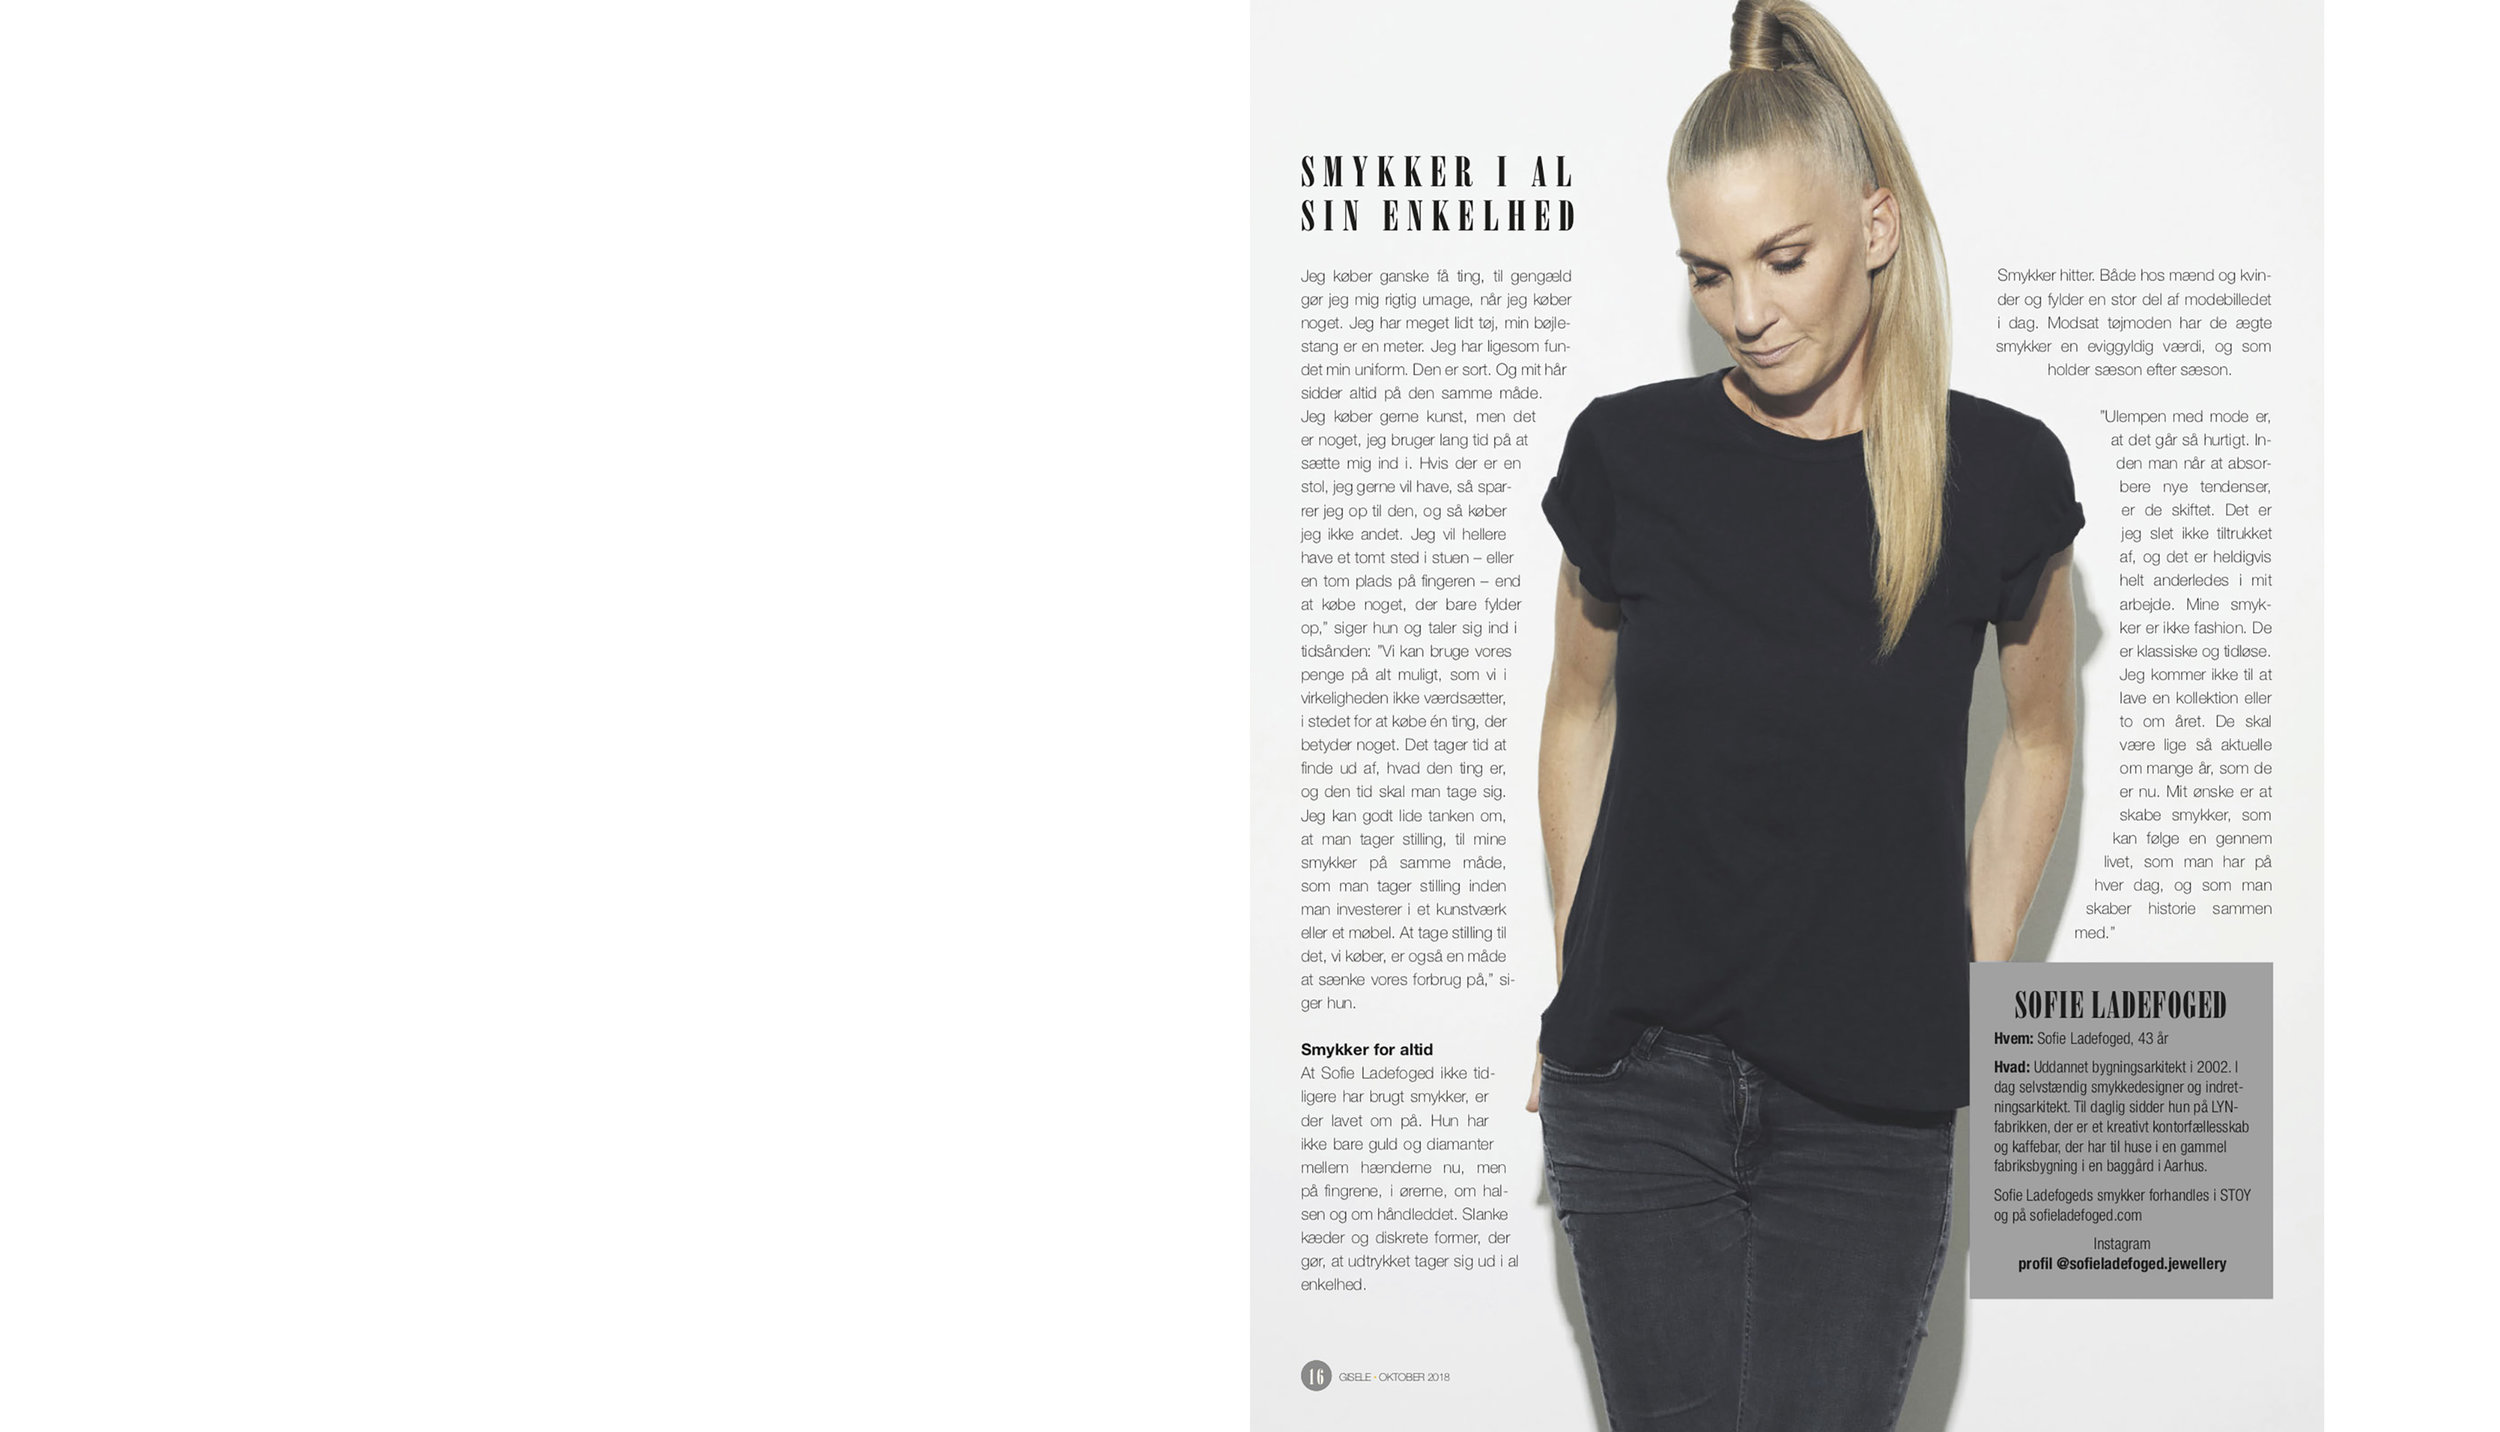 sofie-ladefoged-press-politiken-2018-page-03.jpg